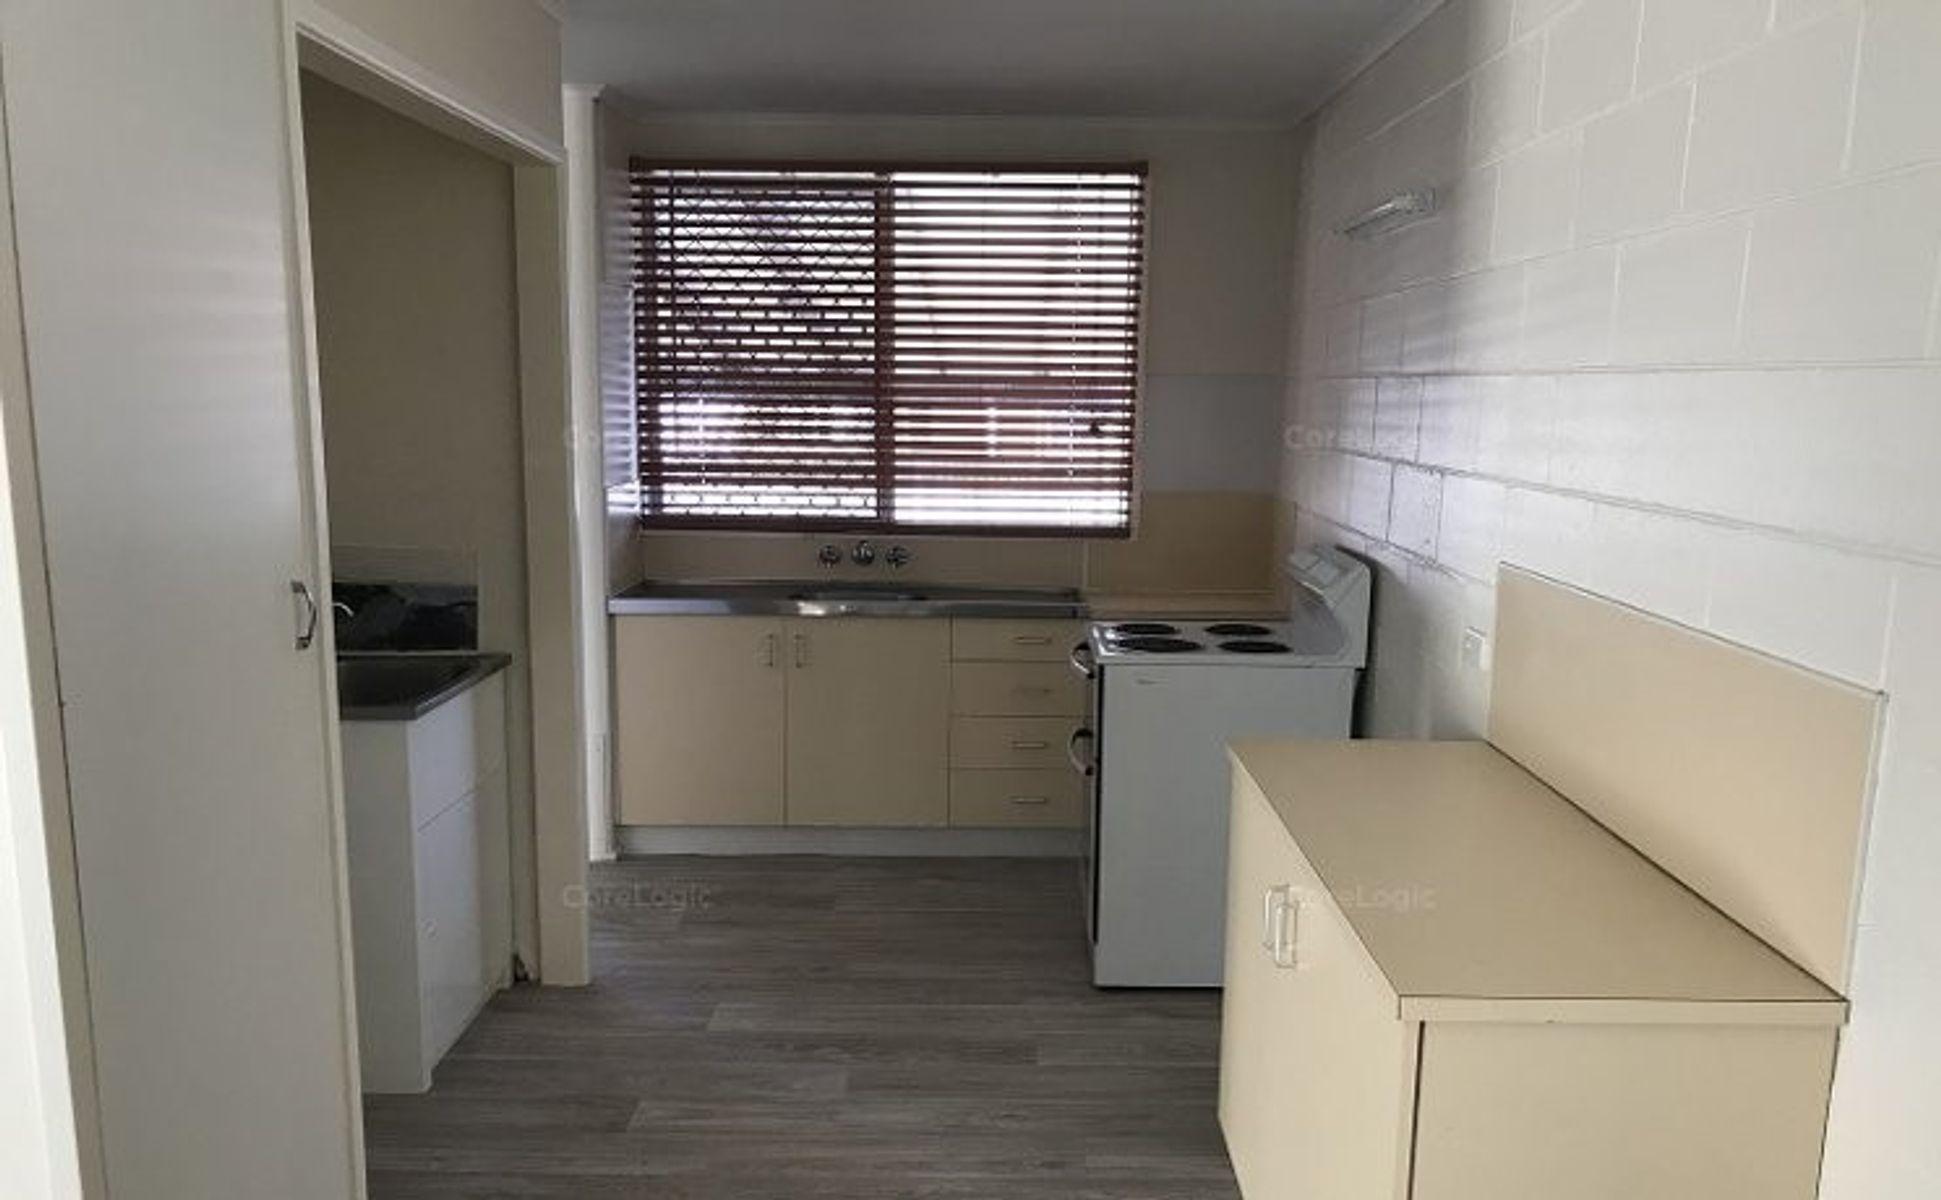 4/8 East Gordon Street, Mackay, QLD 4740